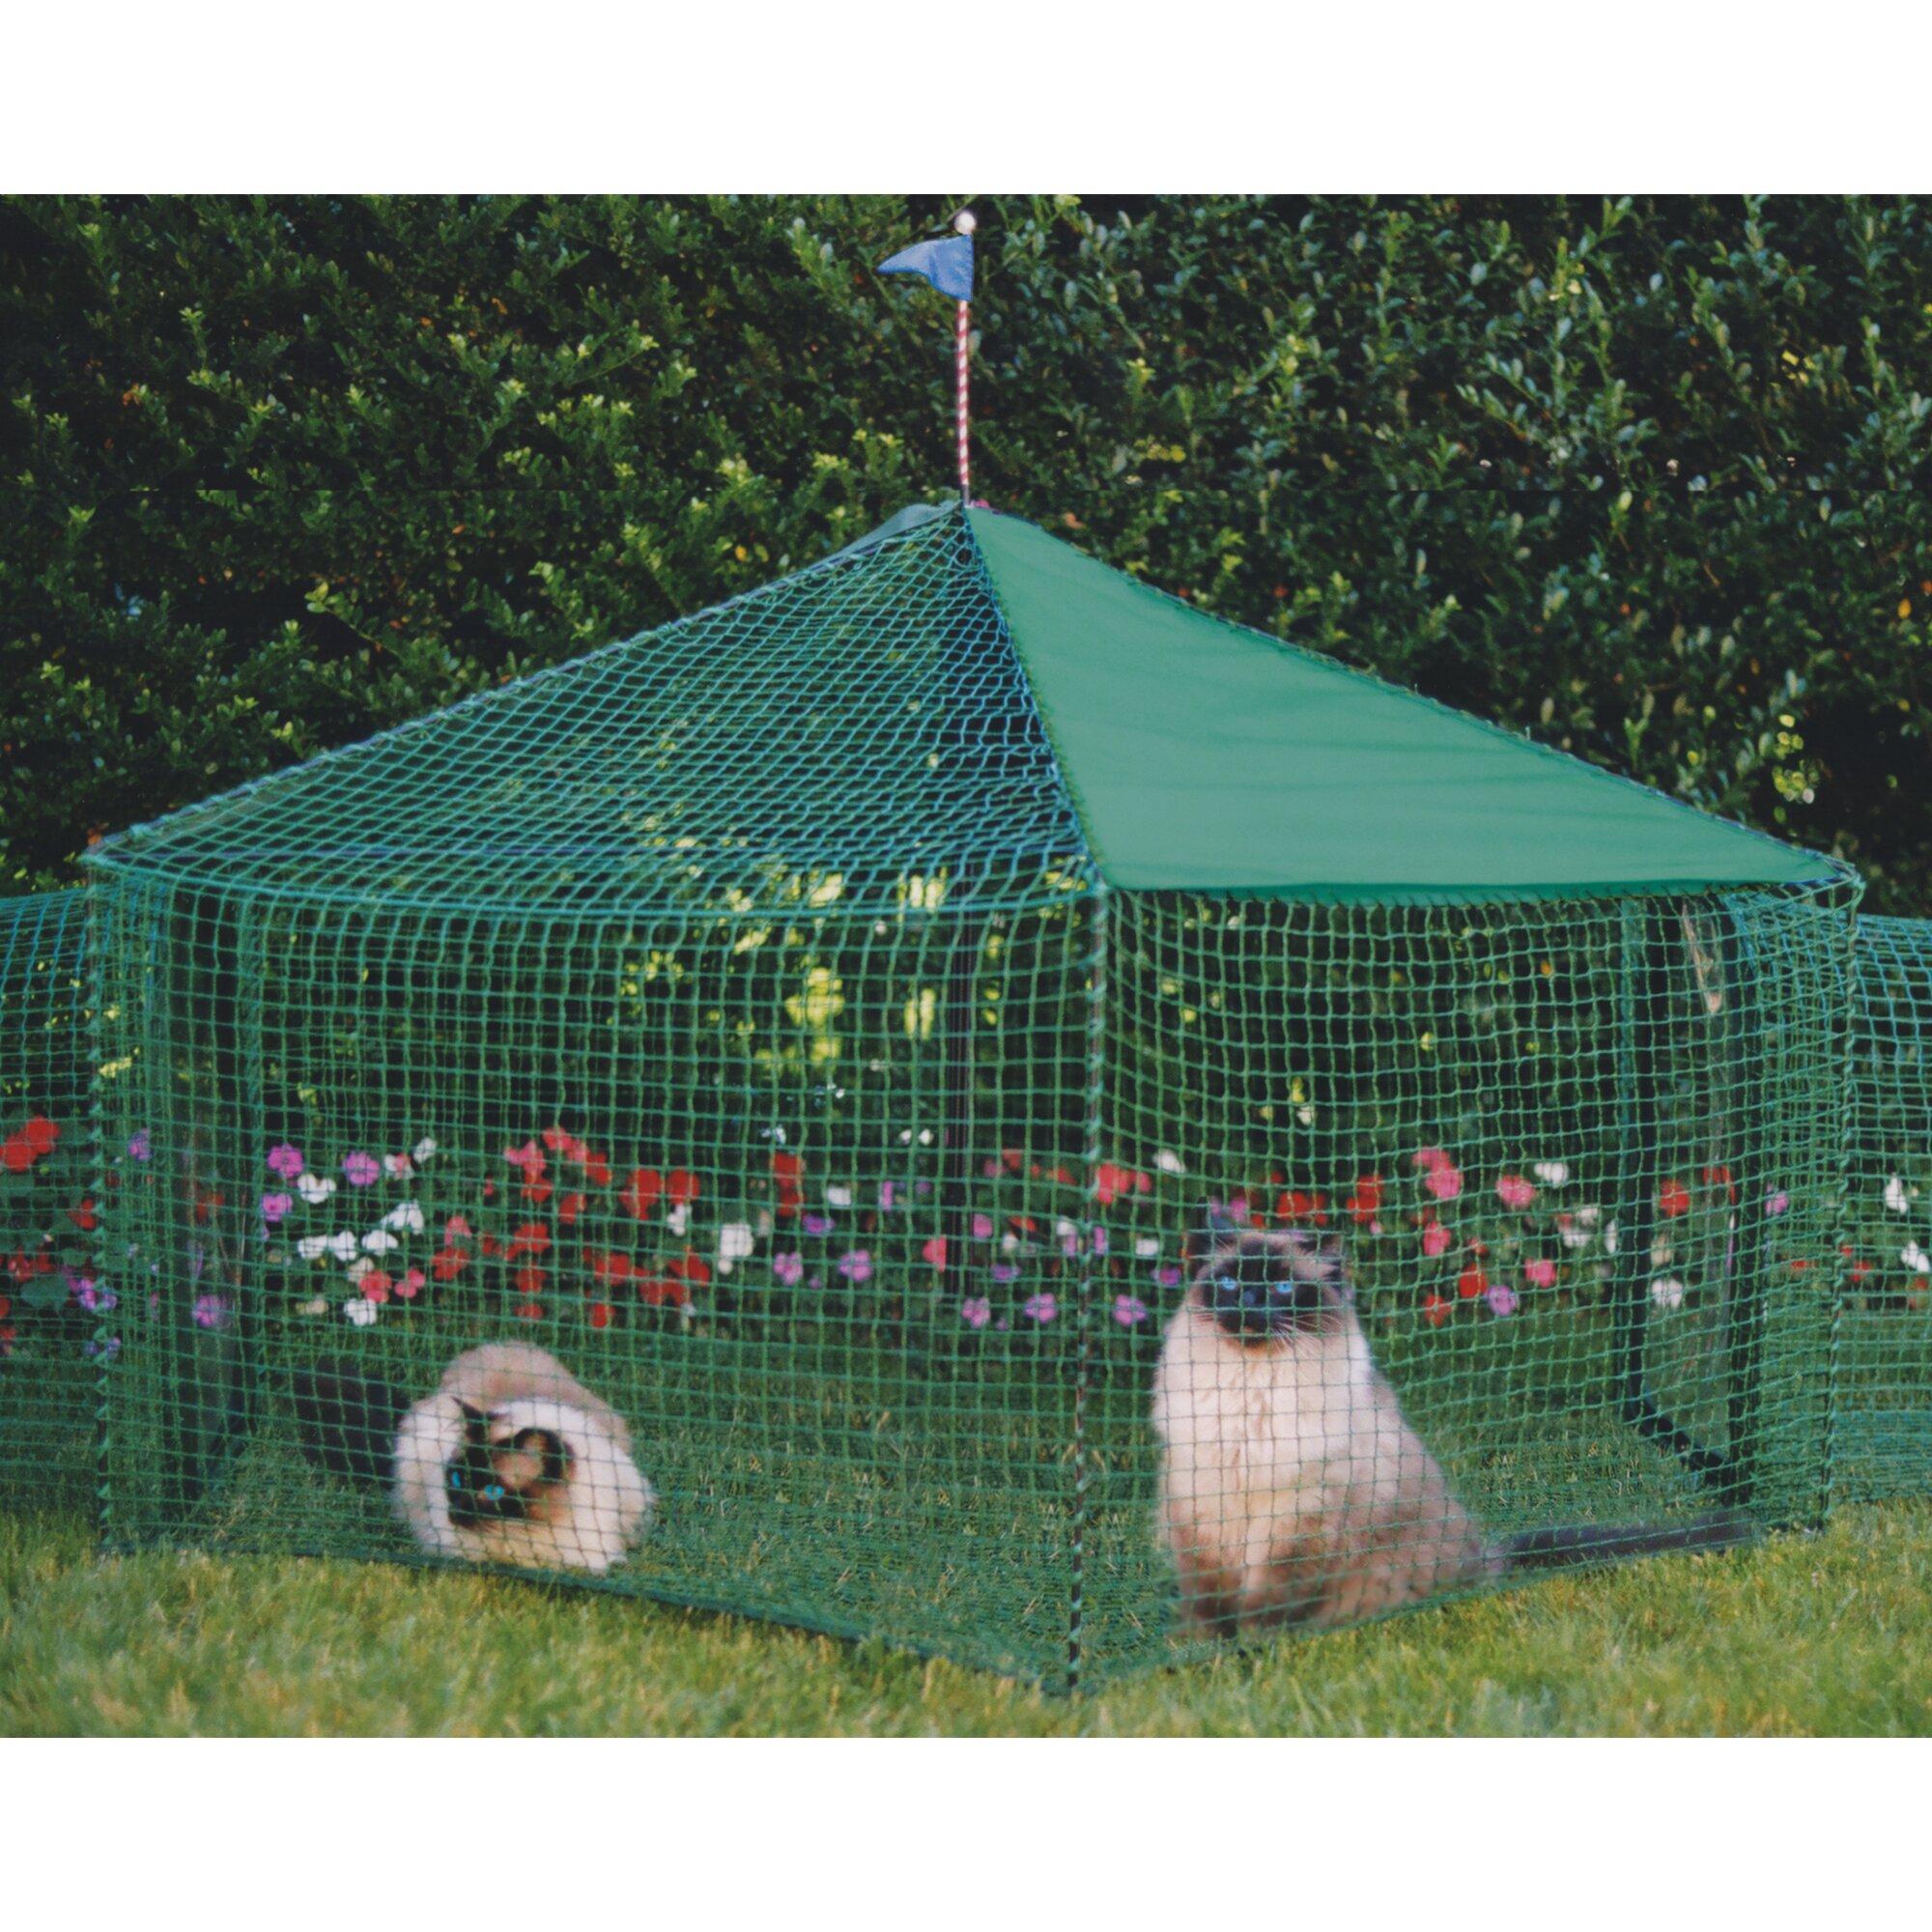 Kittywalk Systems Gazebo Outdoor Pet Playpen & Reviews